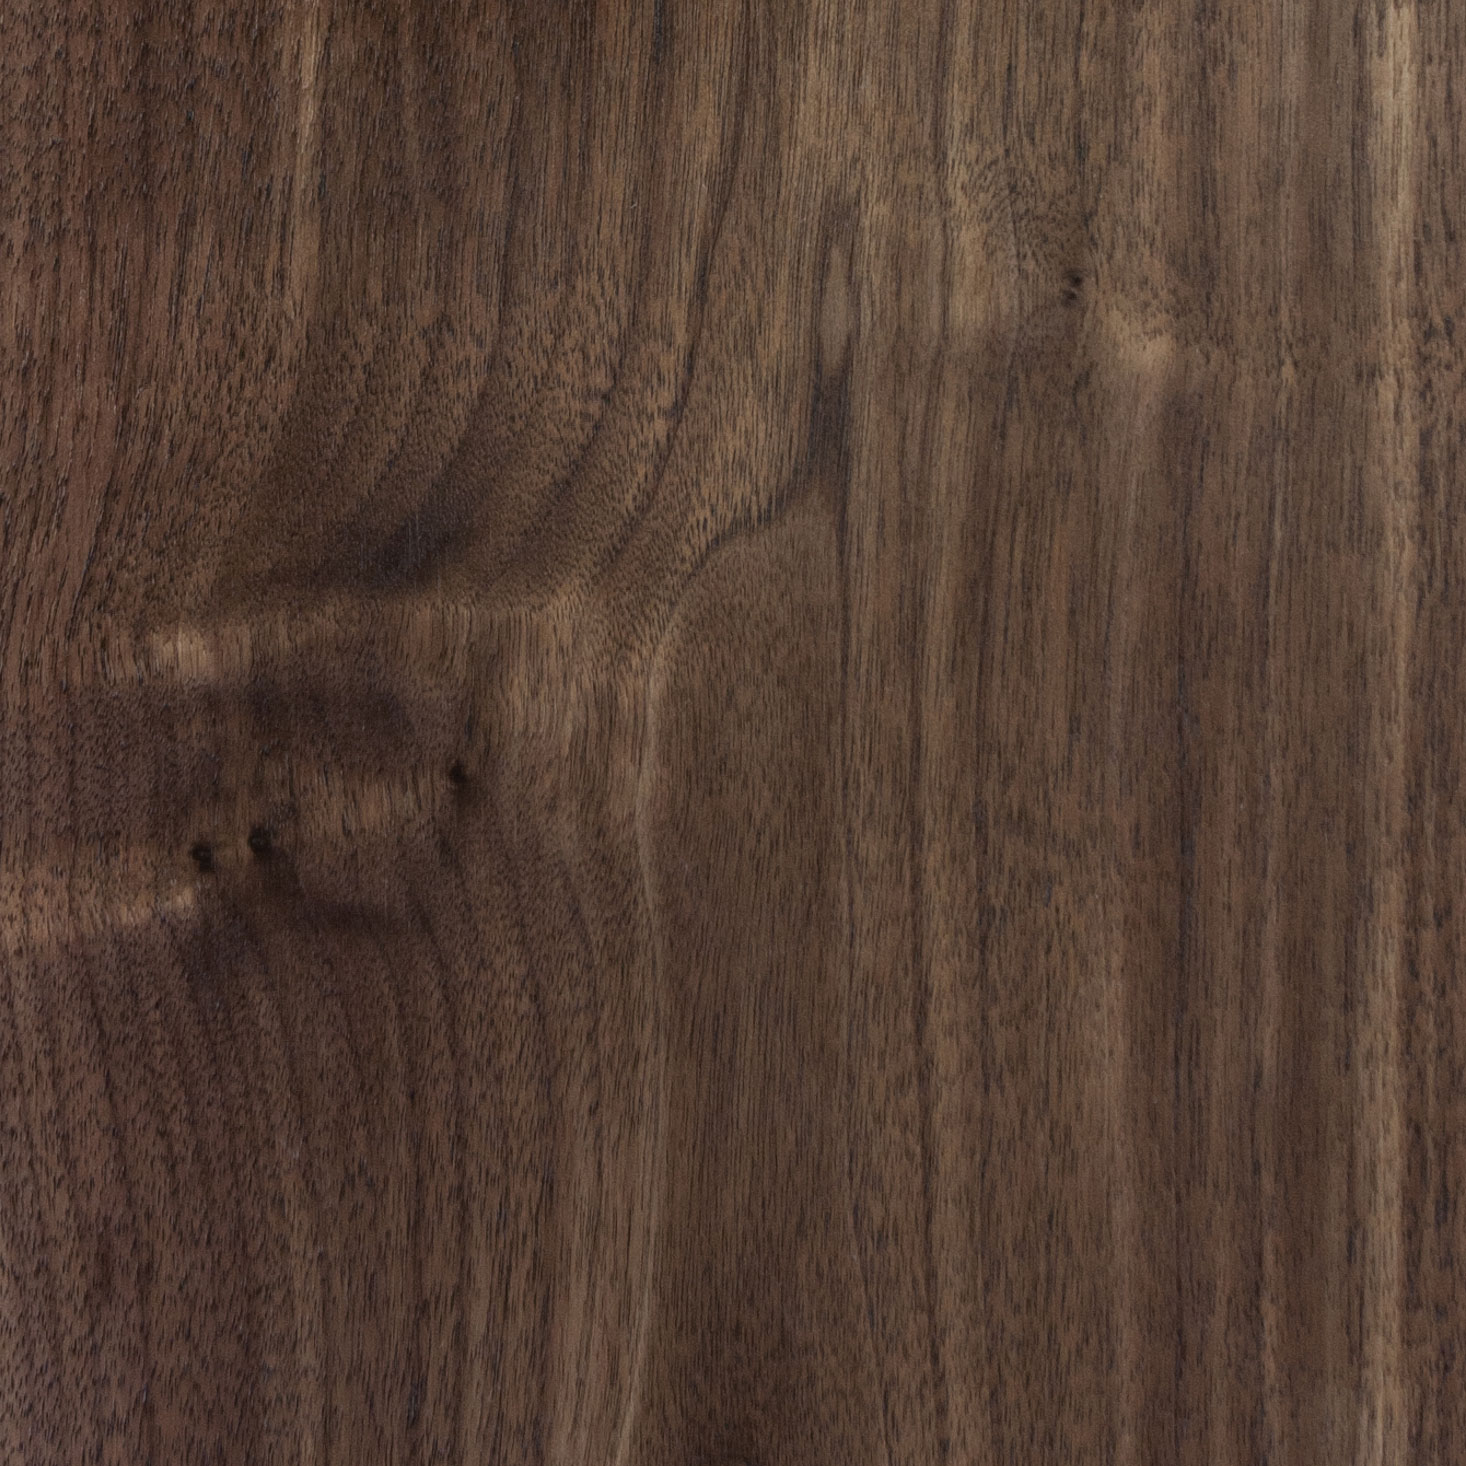 Element7-wide-plank-samples-black-american-walnut-IMG_1907